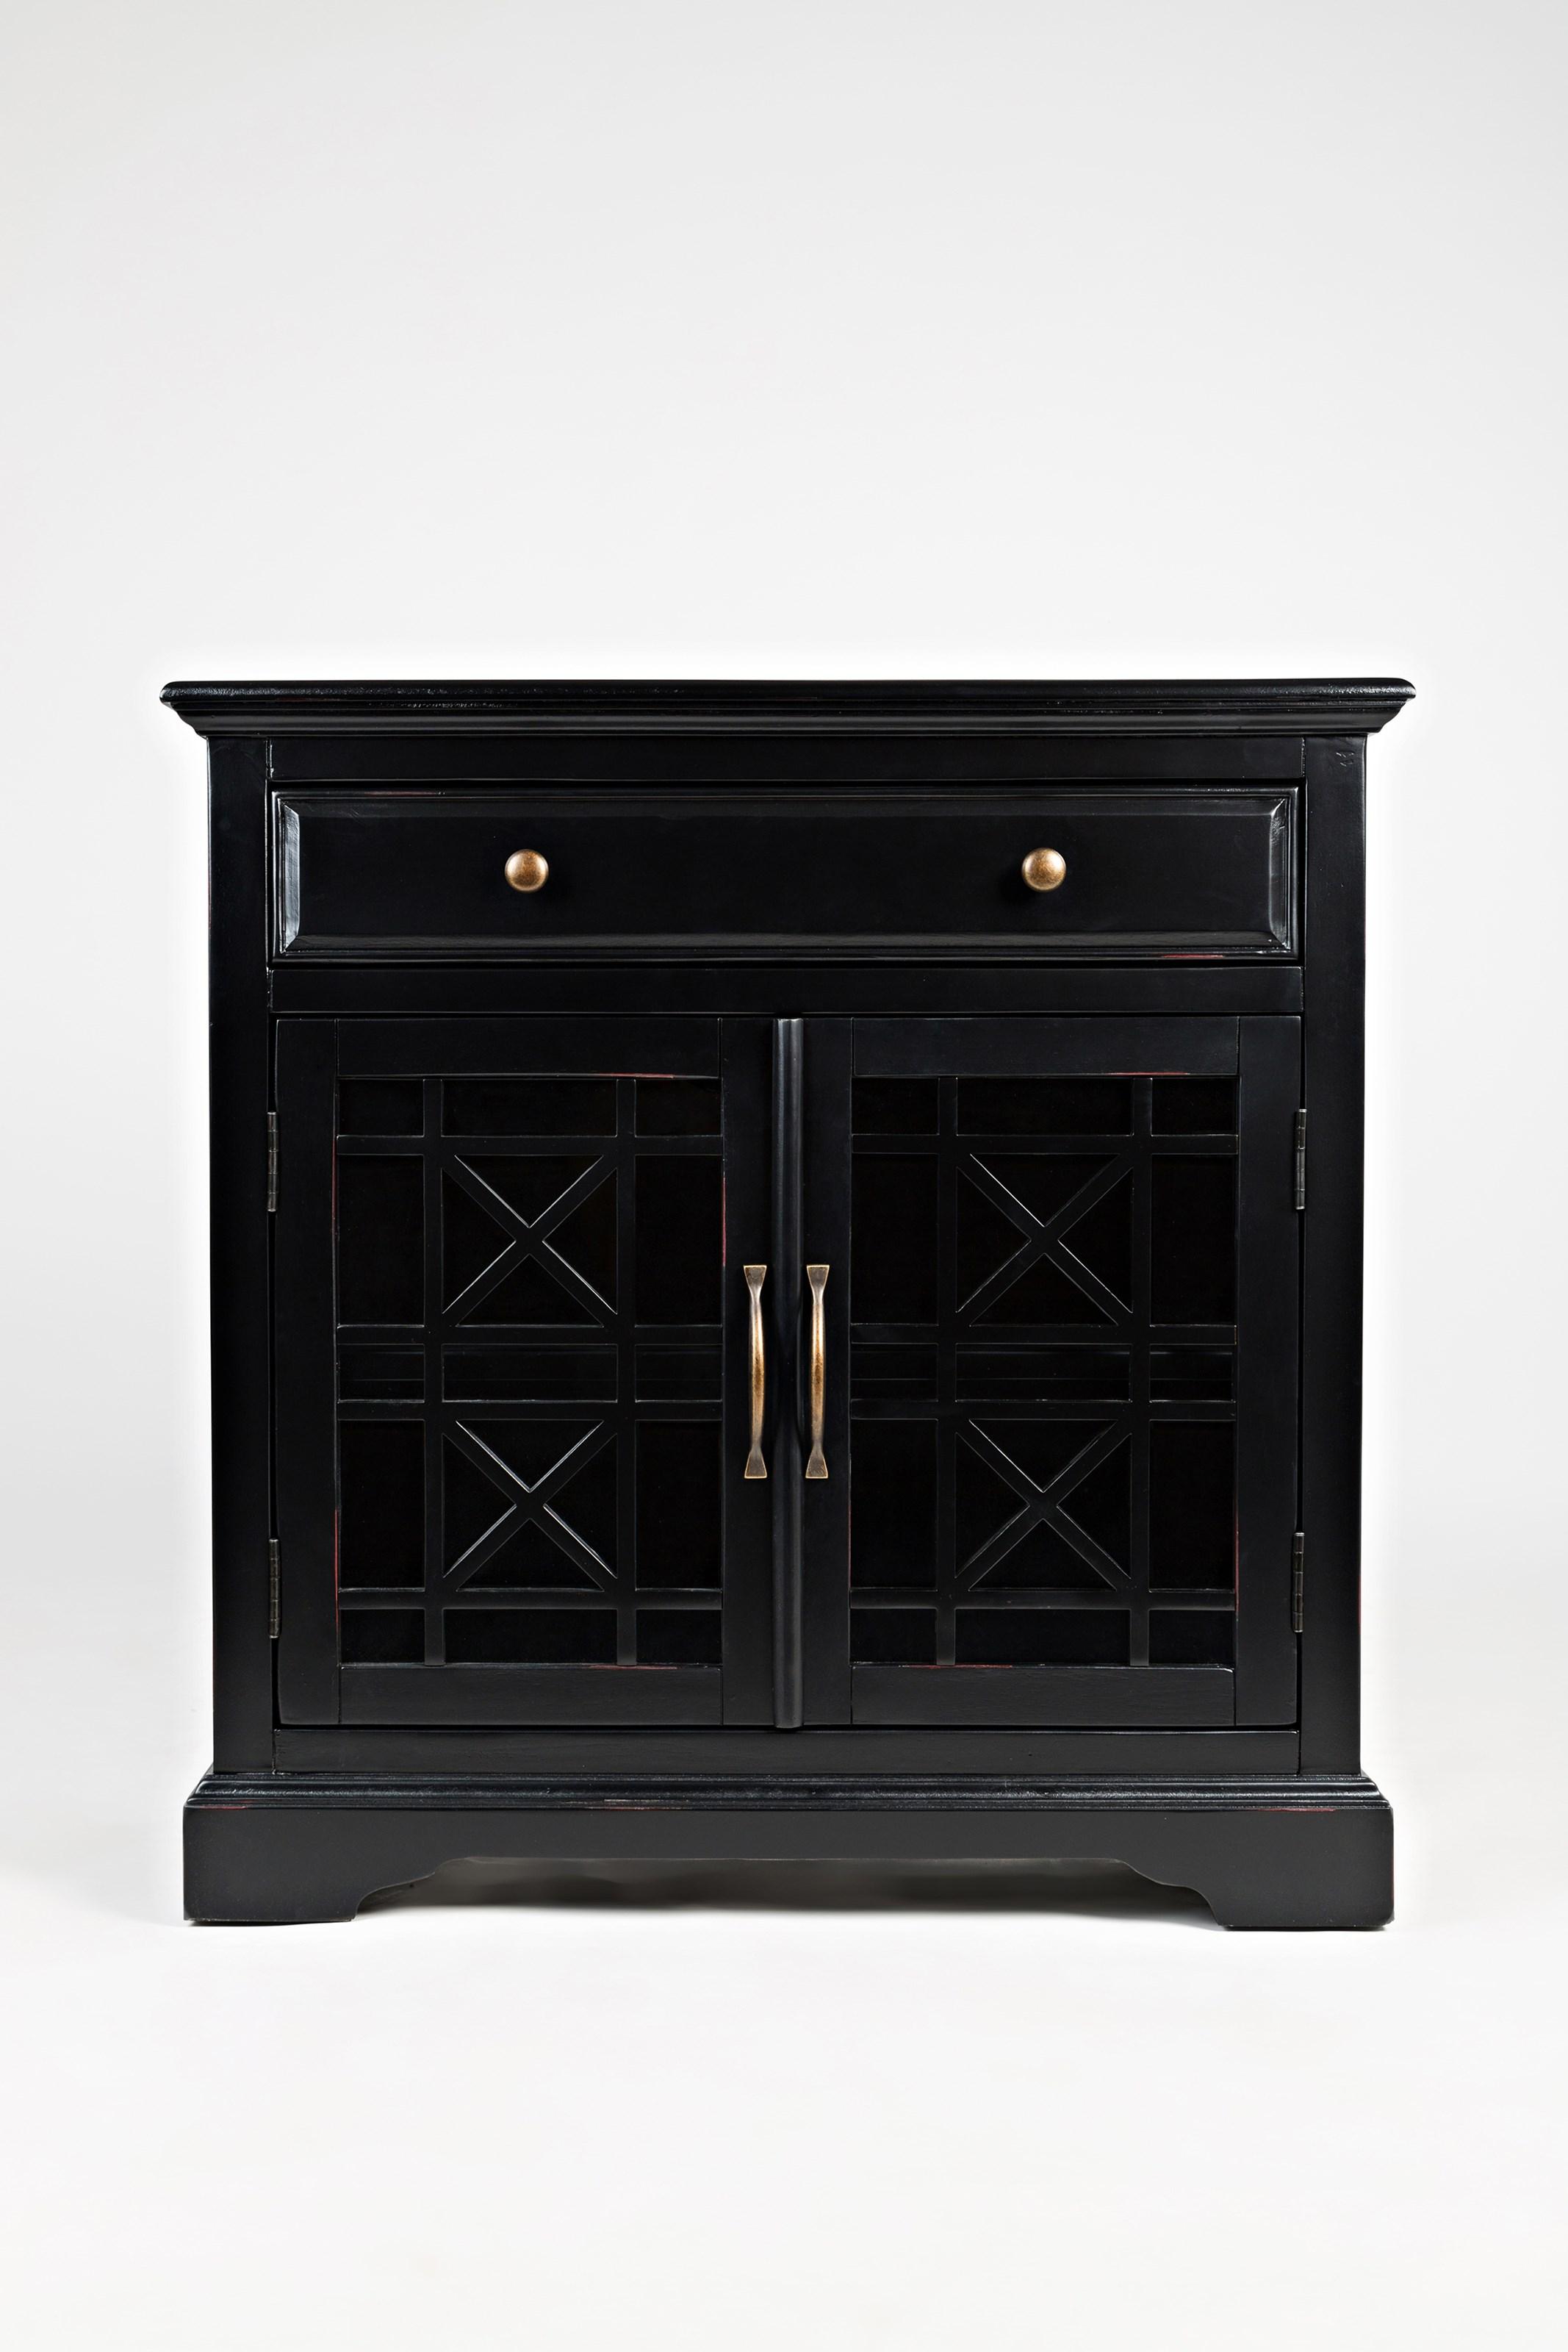 Craftsman Accent Chest by Jofran at HomeWorld Furniture